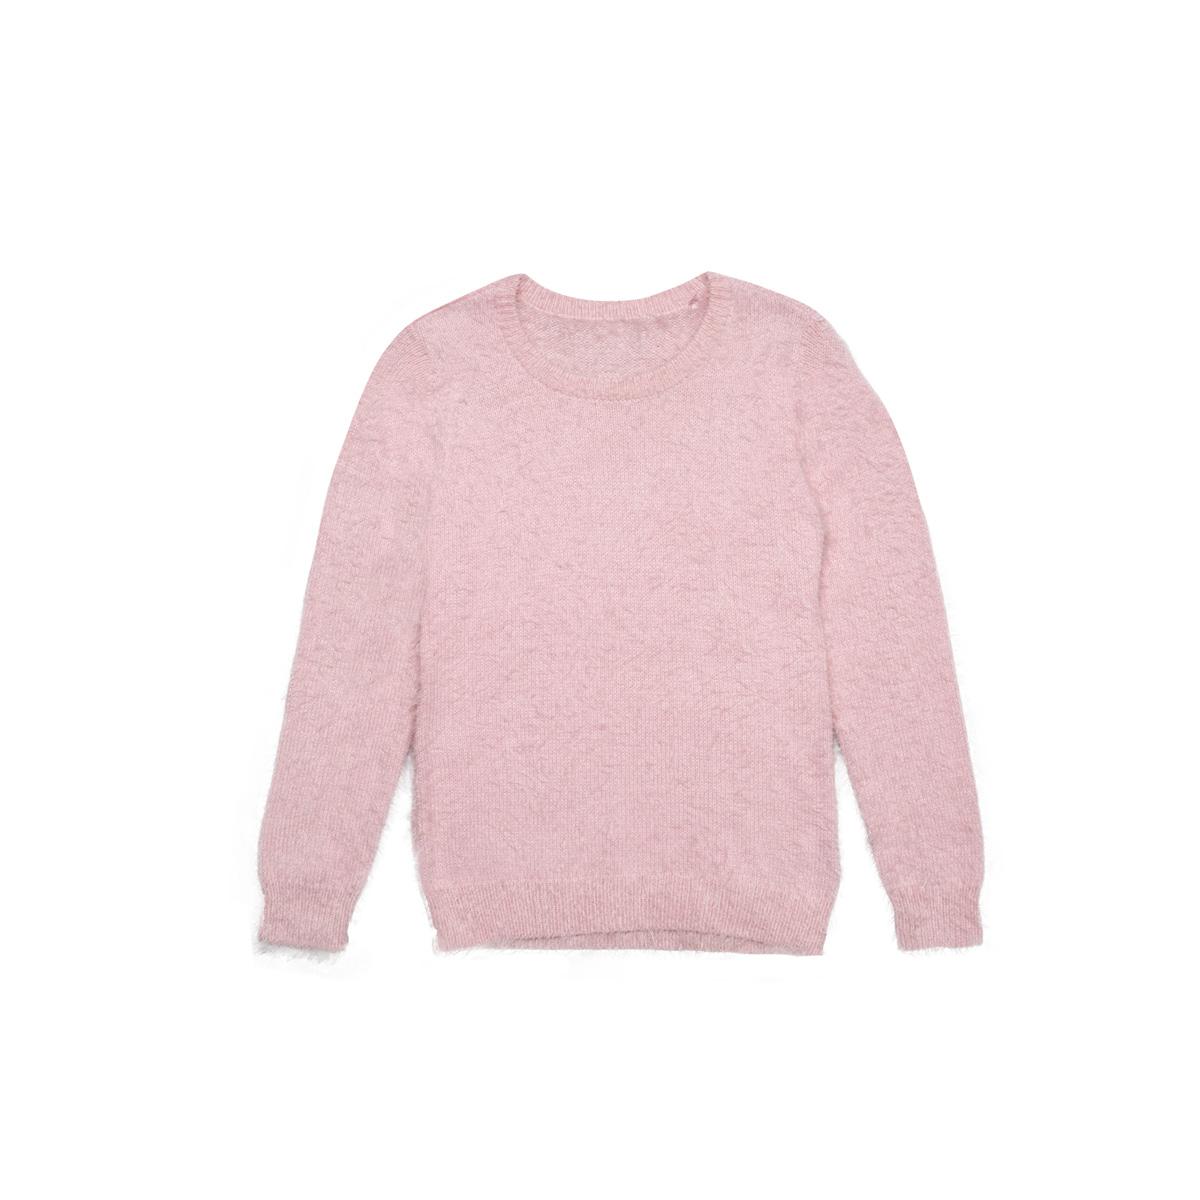 Dekliški pulover, svetlo roza